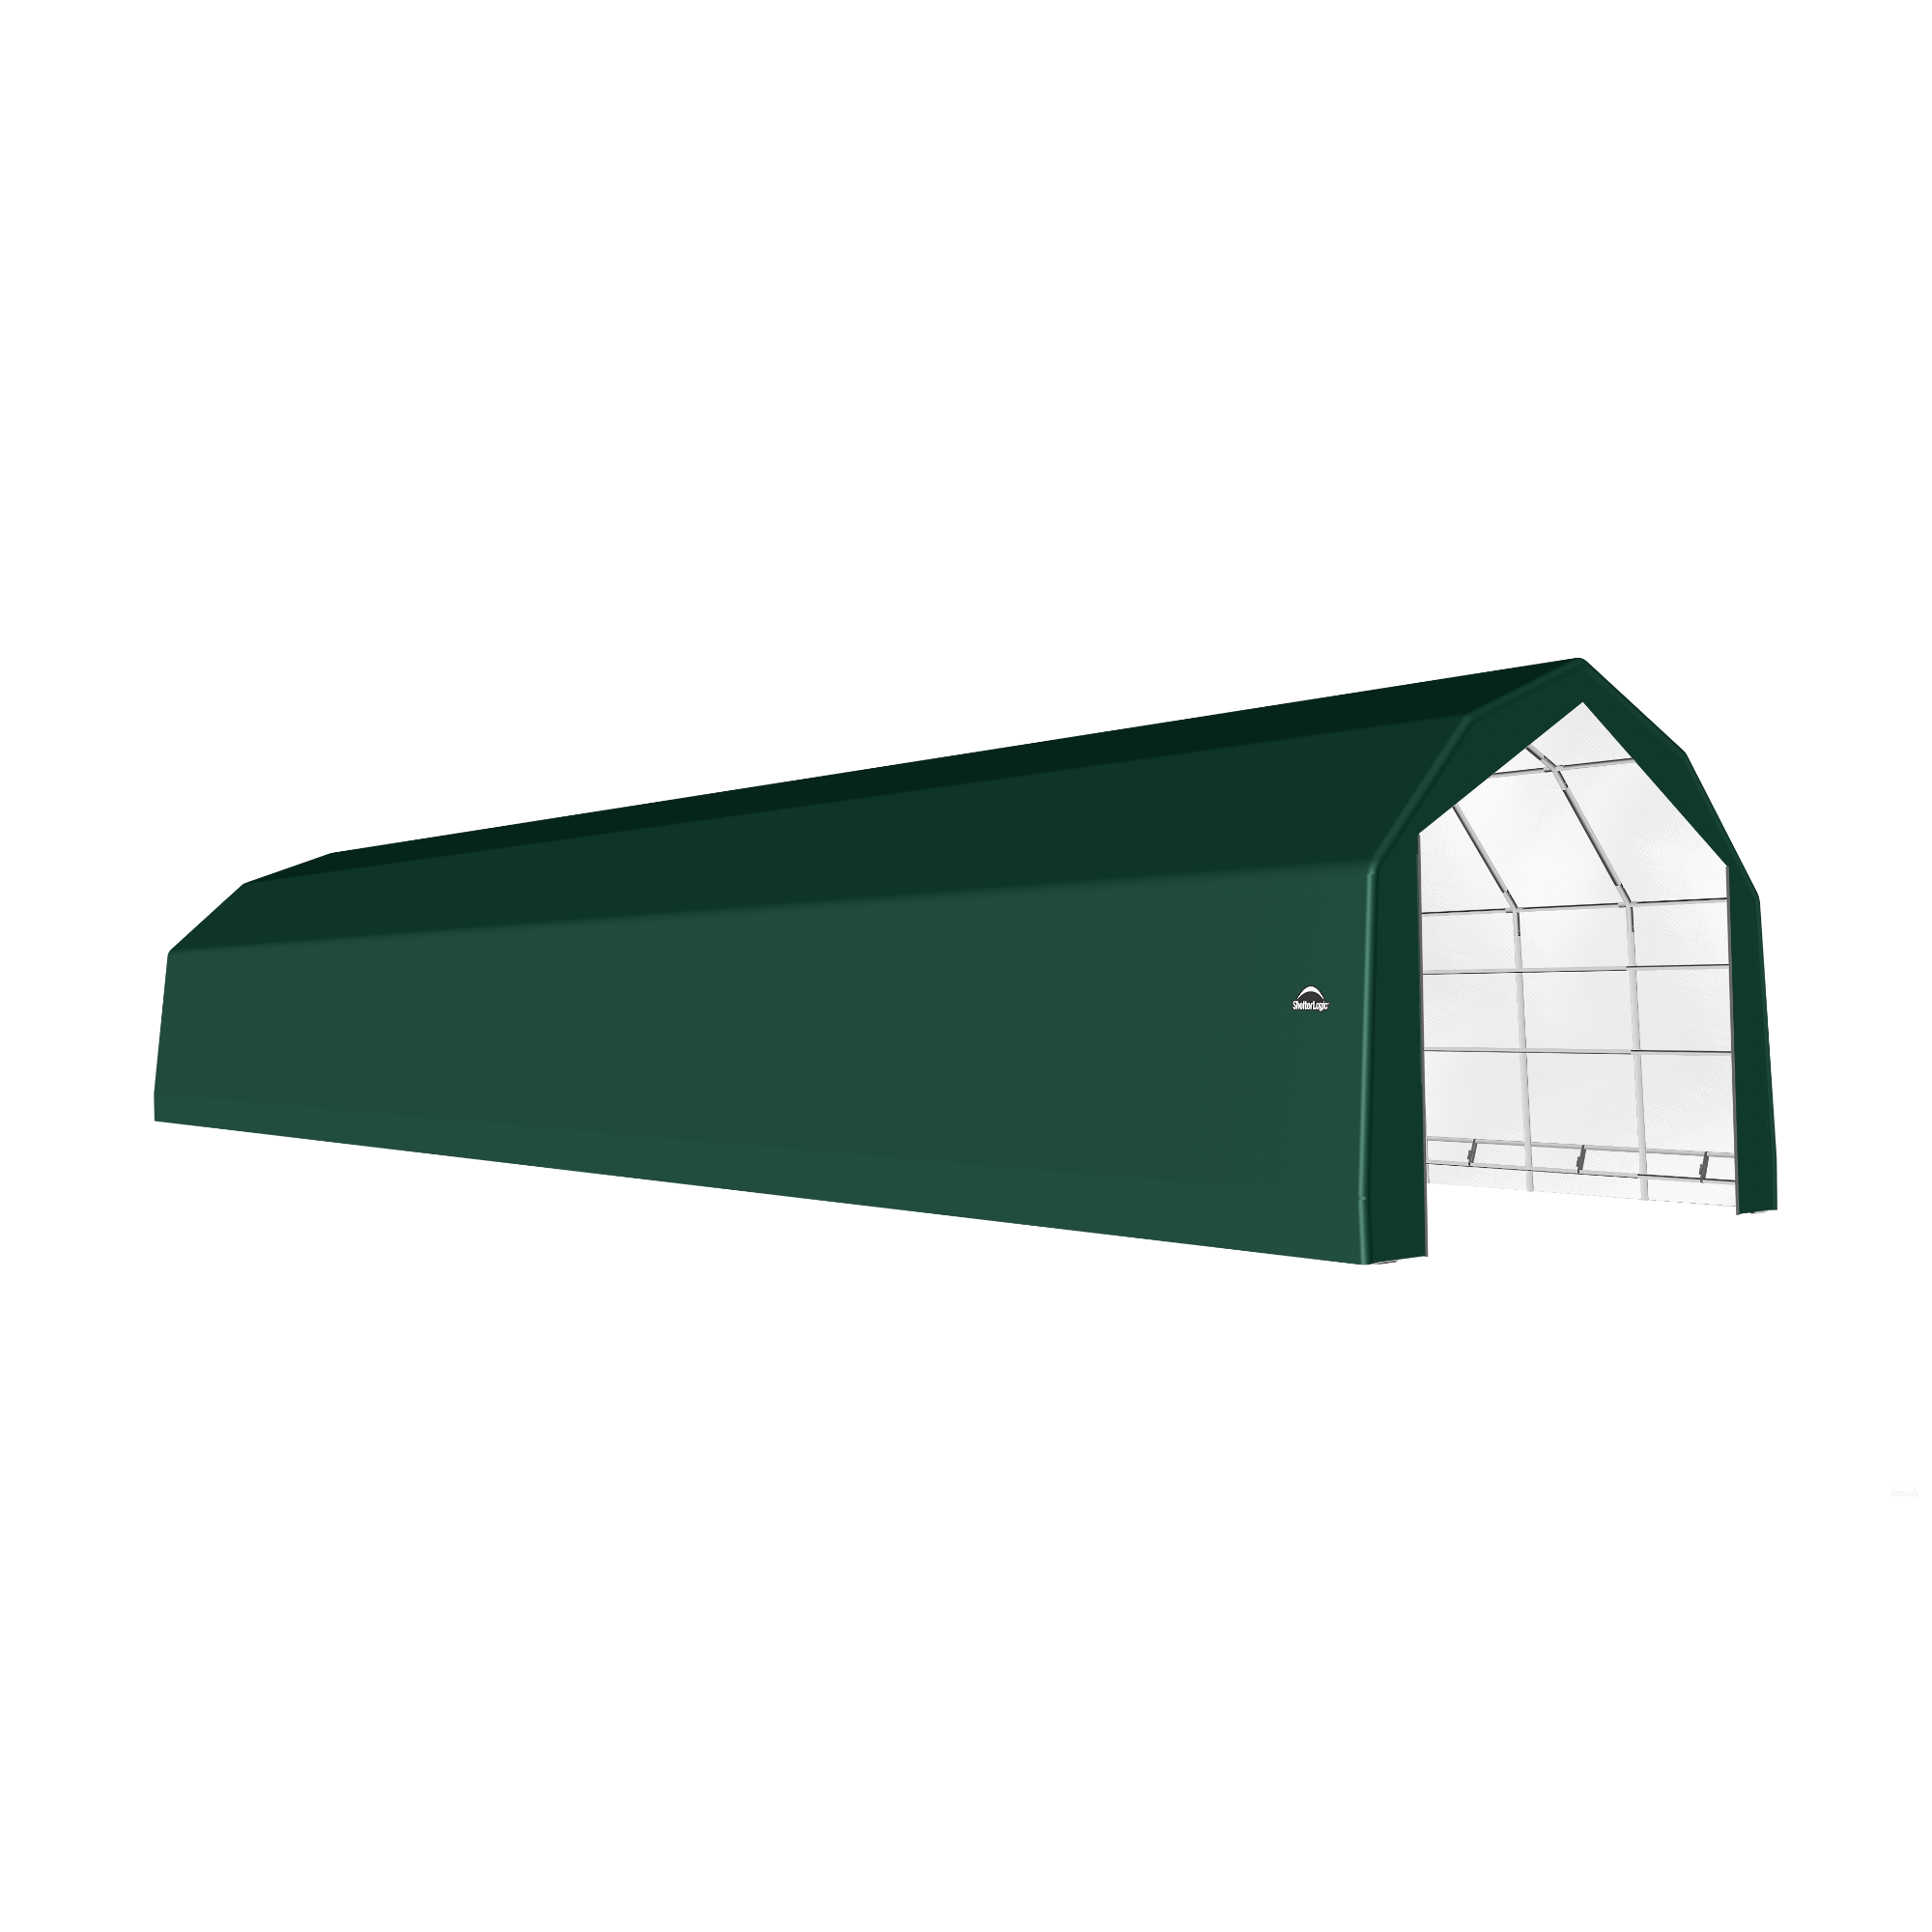 SP Barn 20X76X15 Green 14 oz PE Shelter